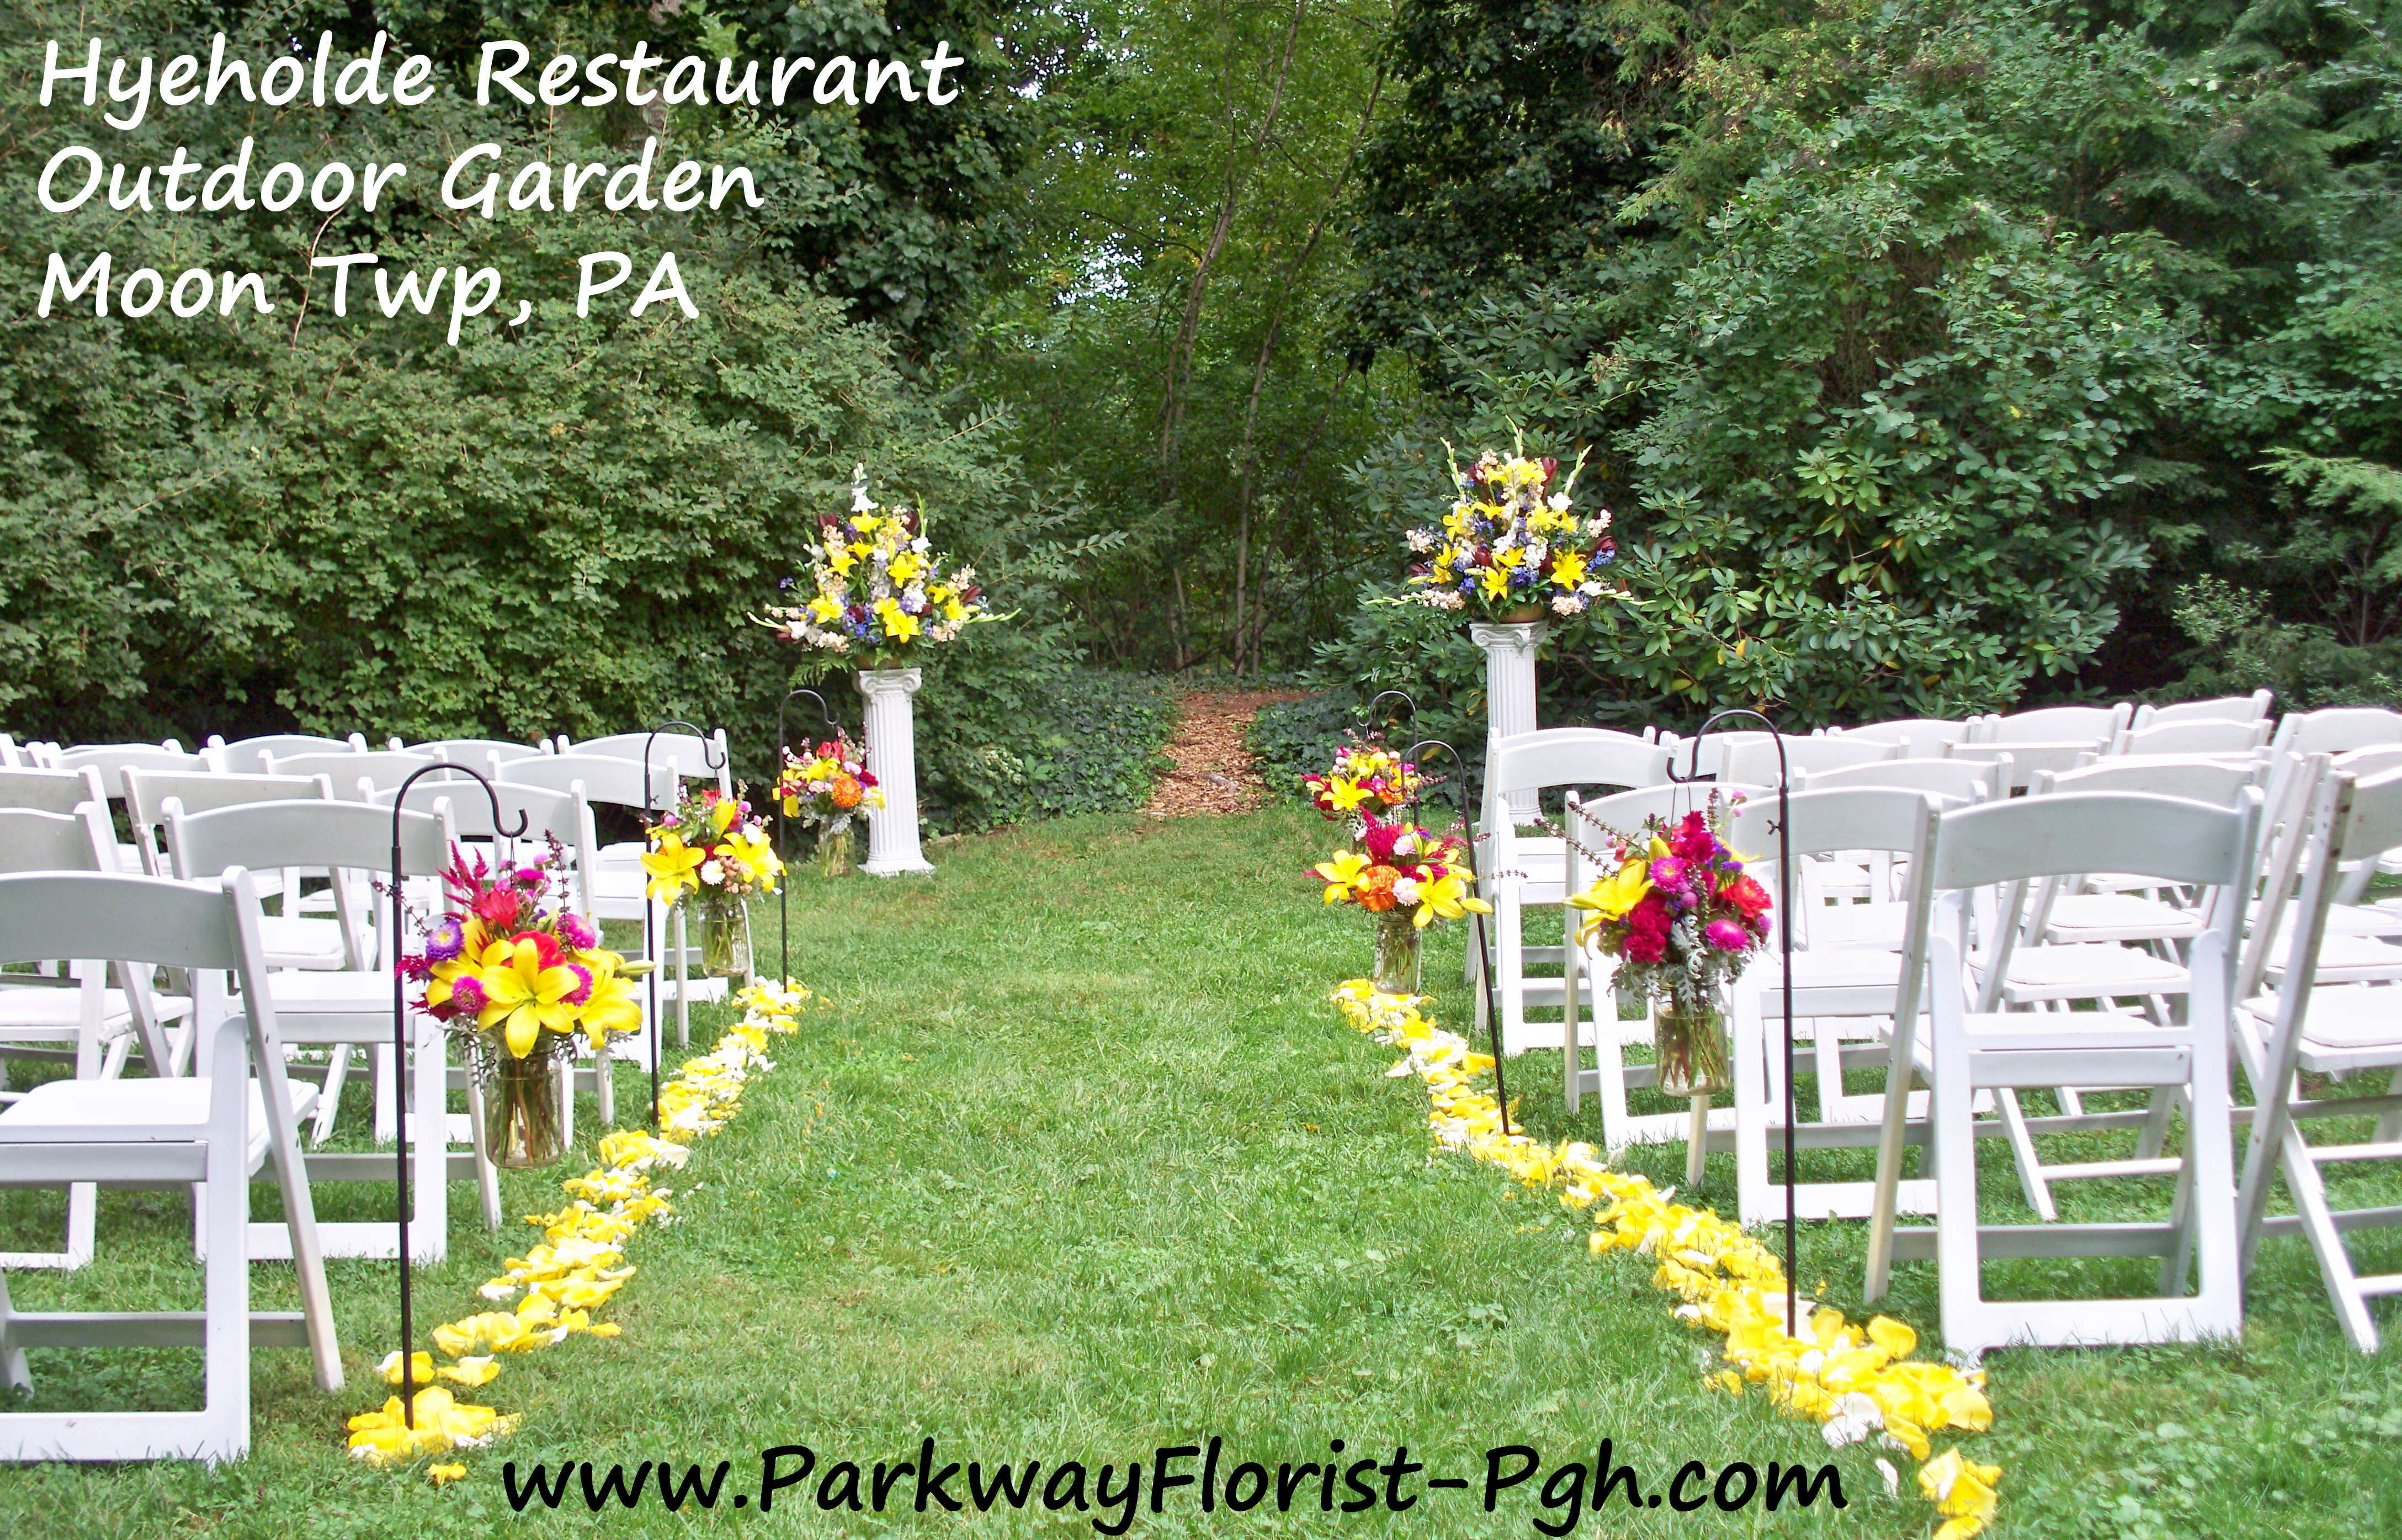 hyeholde restaurant outdoor garden 1 parkway florist pittsburgh blog